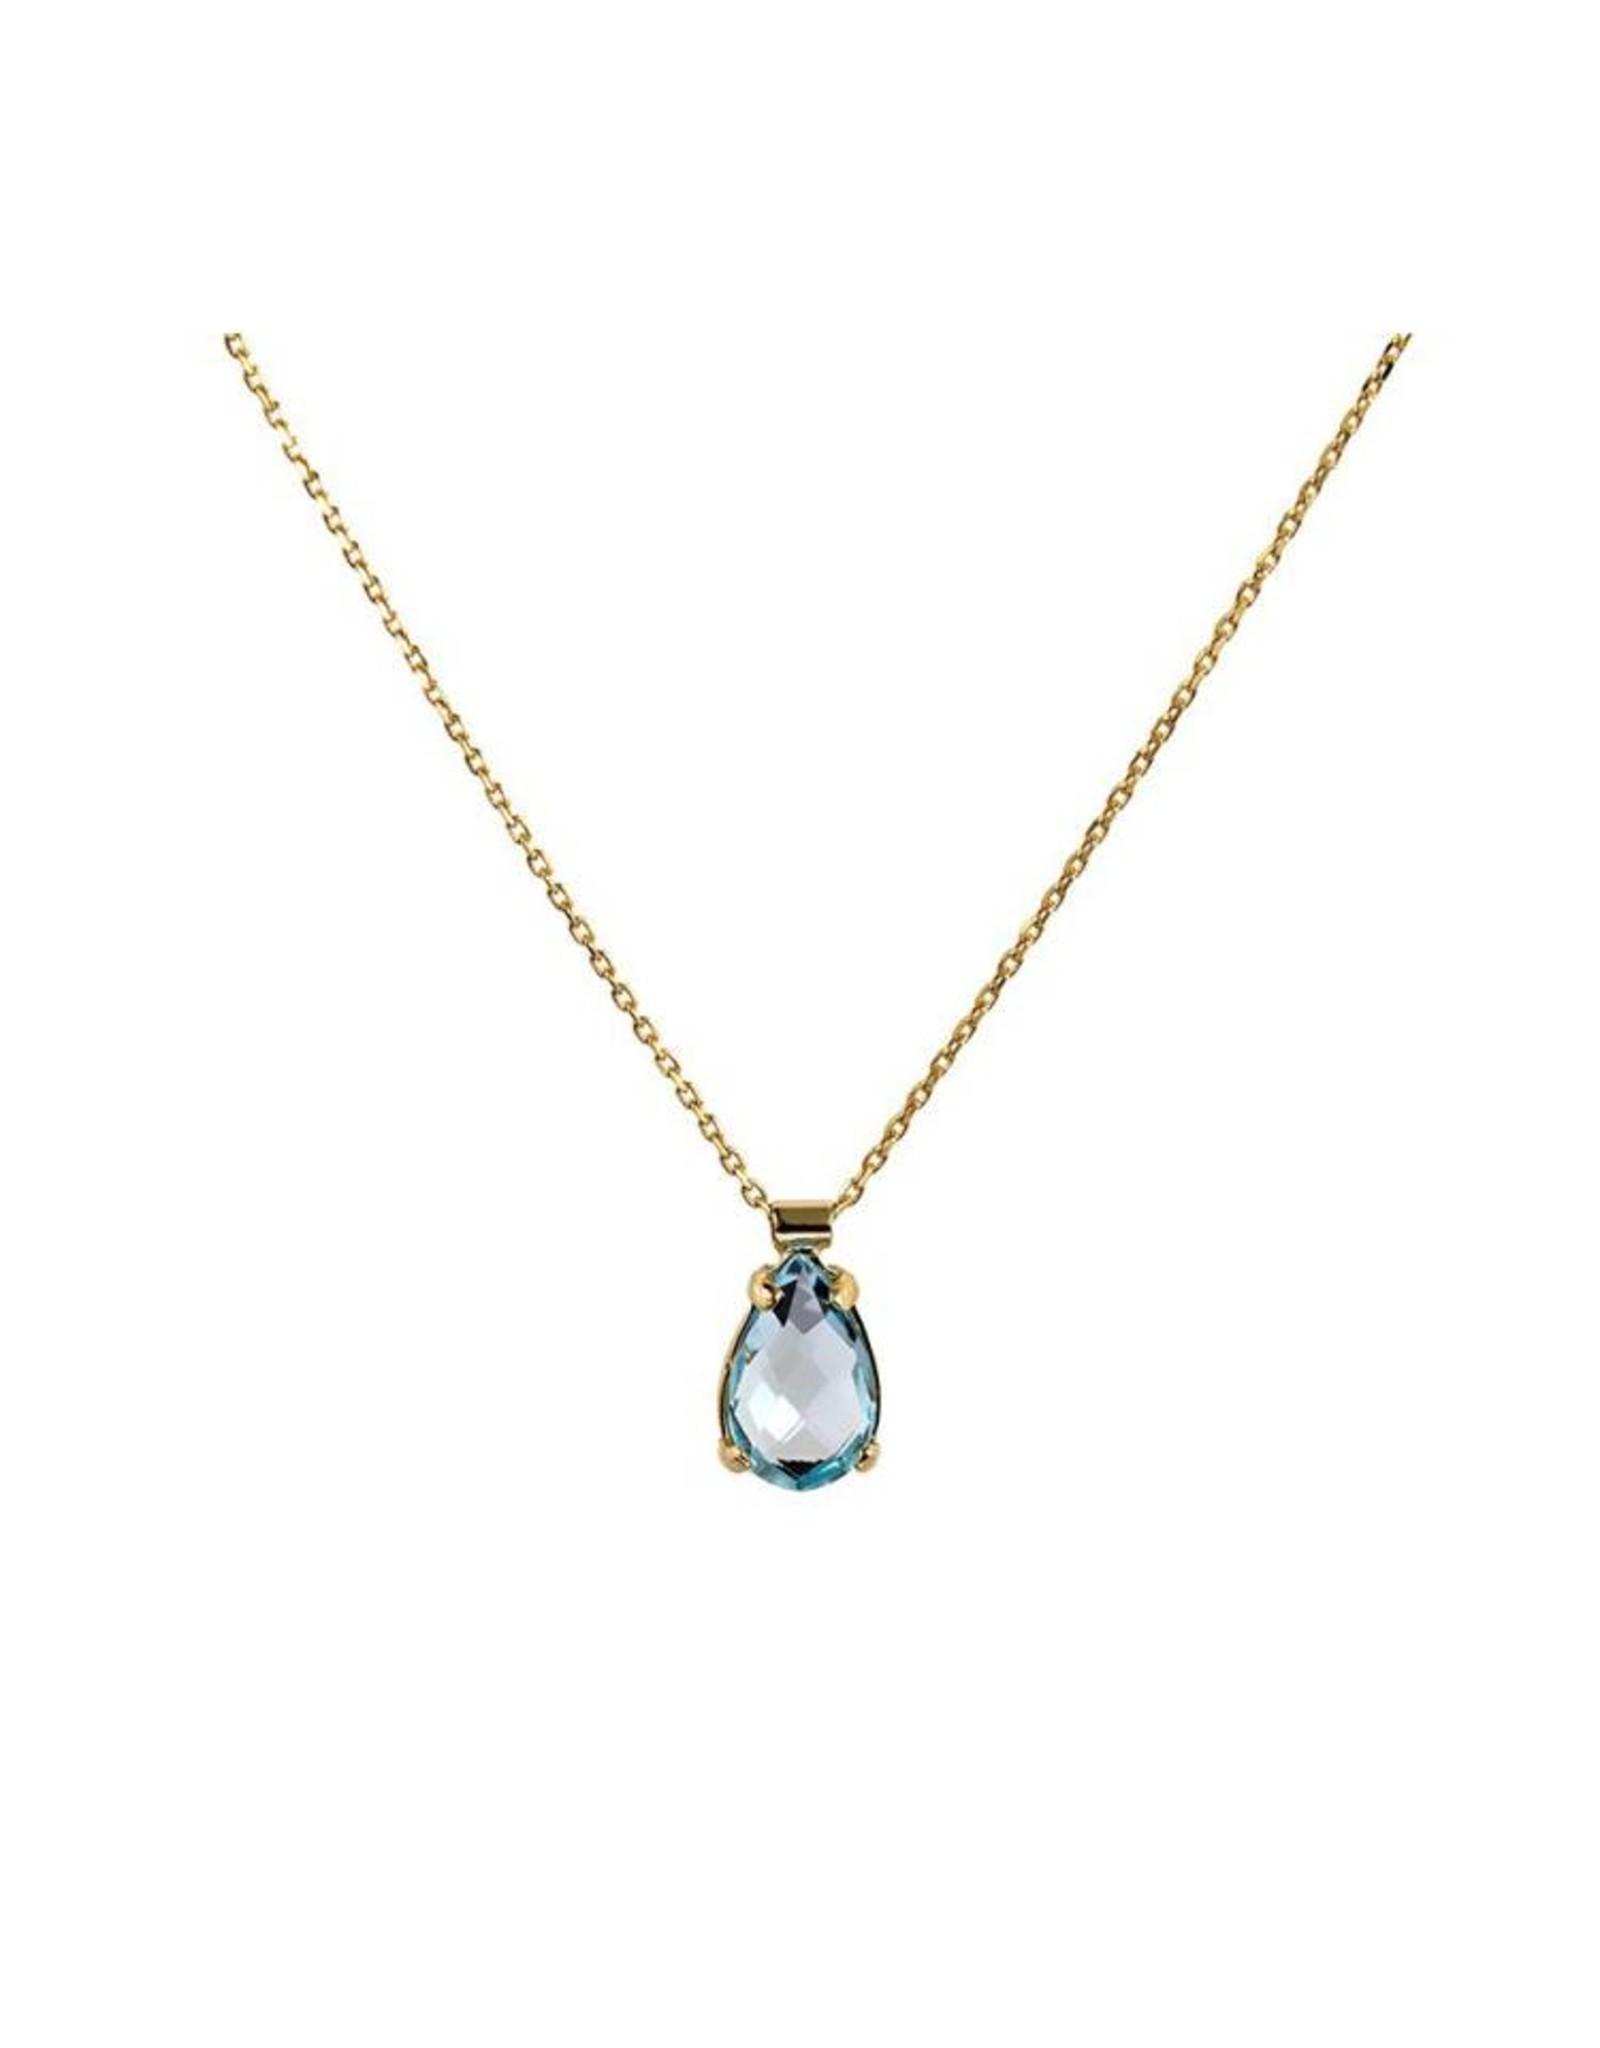 Navarro Necklace - Gold - Gemstones